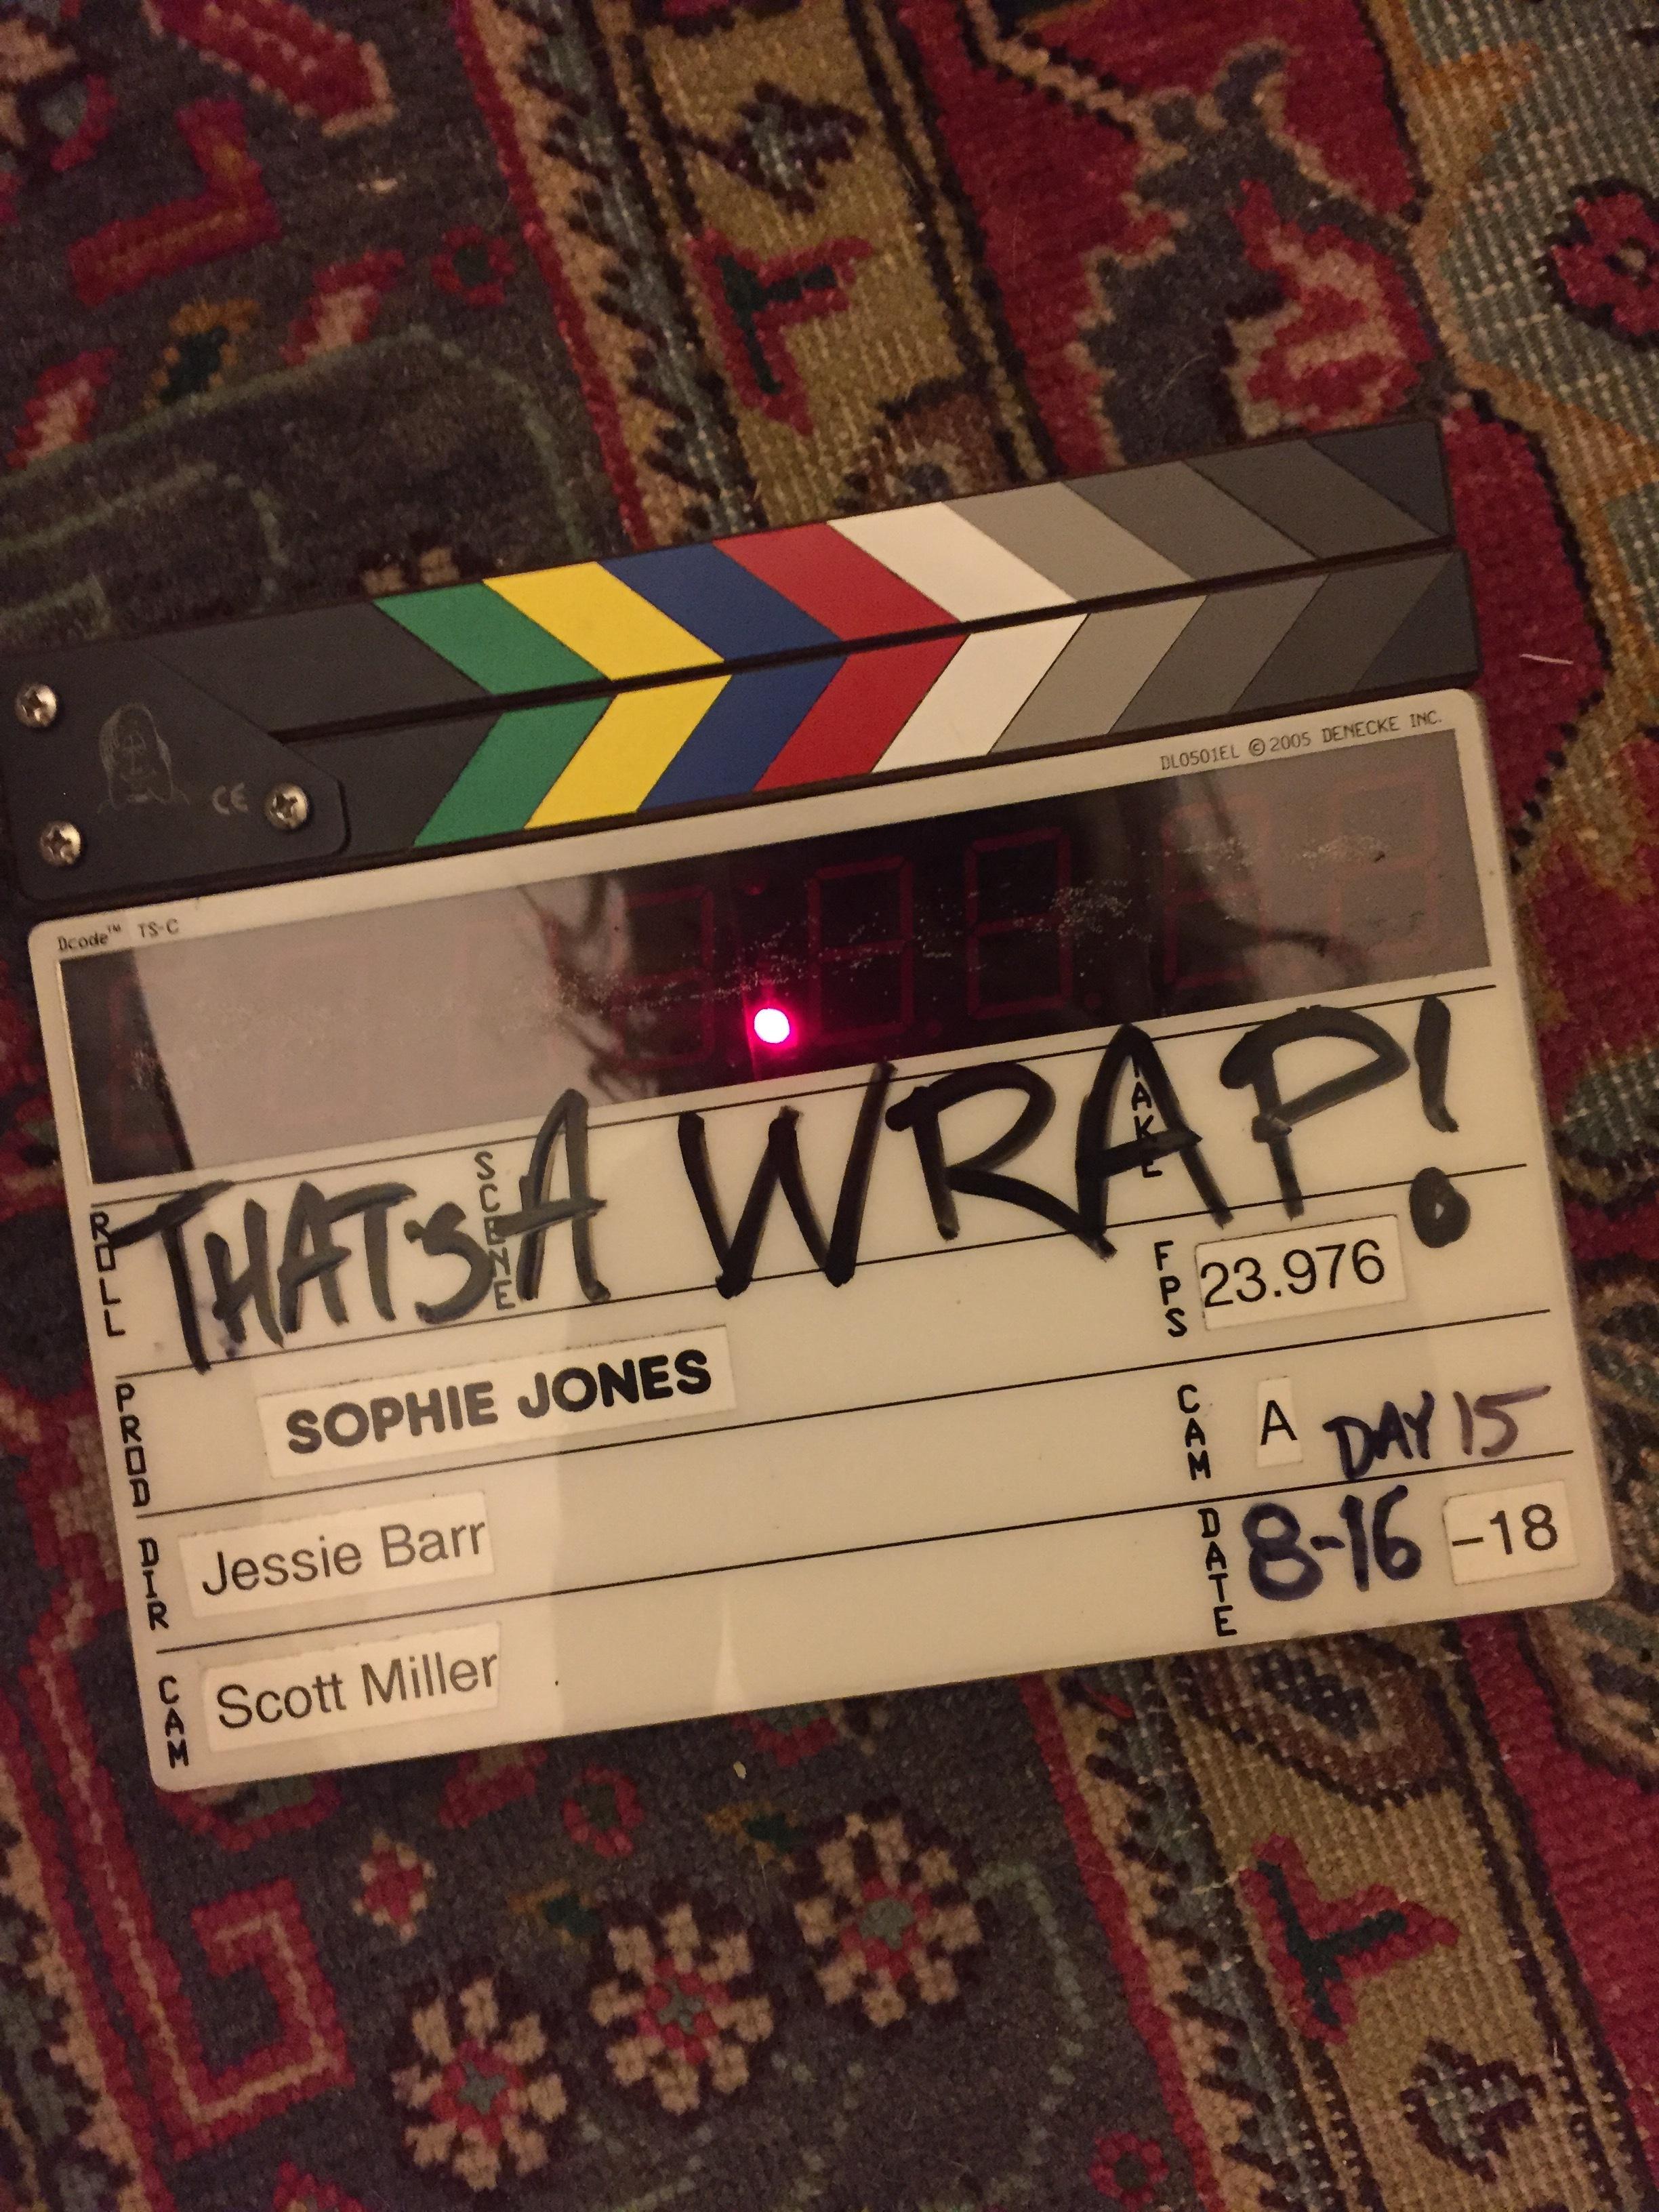 That's a wrap on SOPHIE JONES - Production wrapped on Jessie's feature film directorial debut, SOPHIE JONES. SOPHIEJONESMOVIE.COM